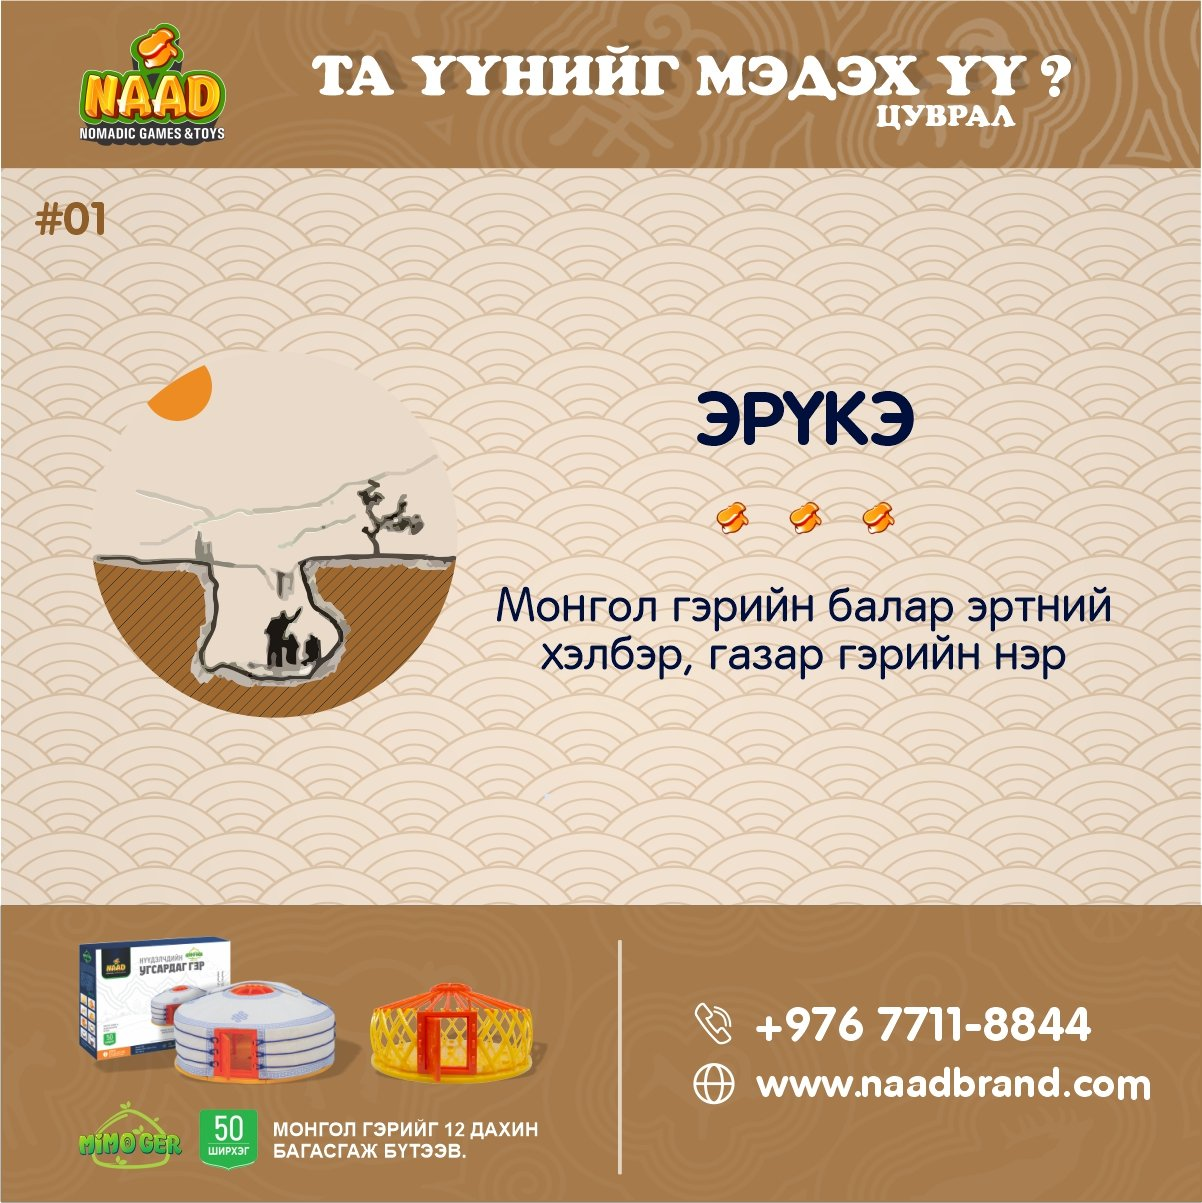 #1 ЭРҮКЭ - NAAD   NomadPedia төсөл